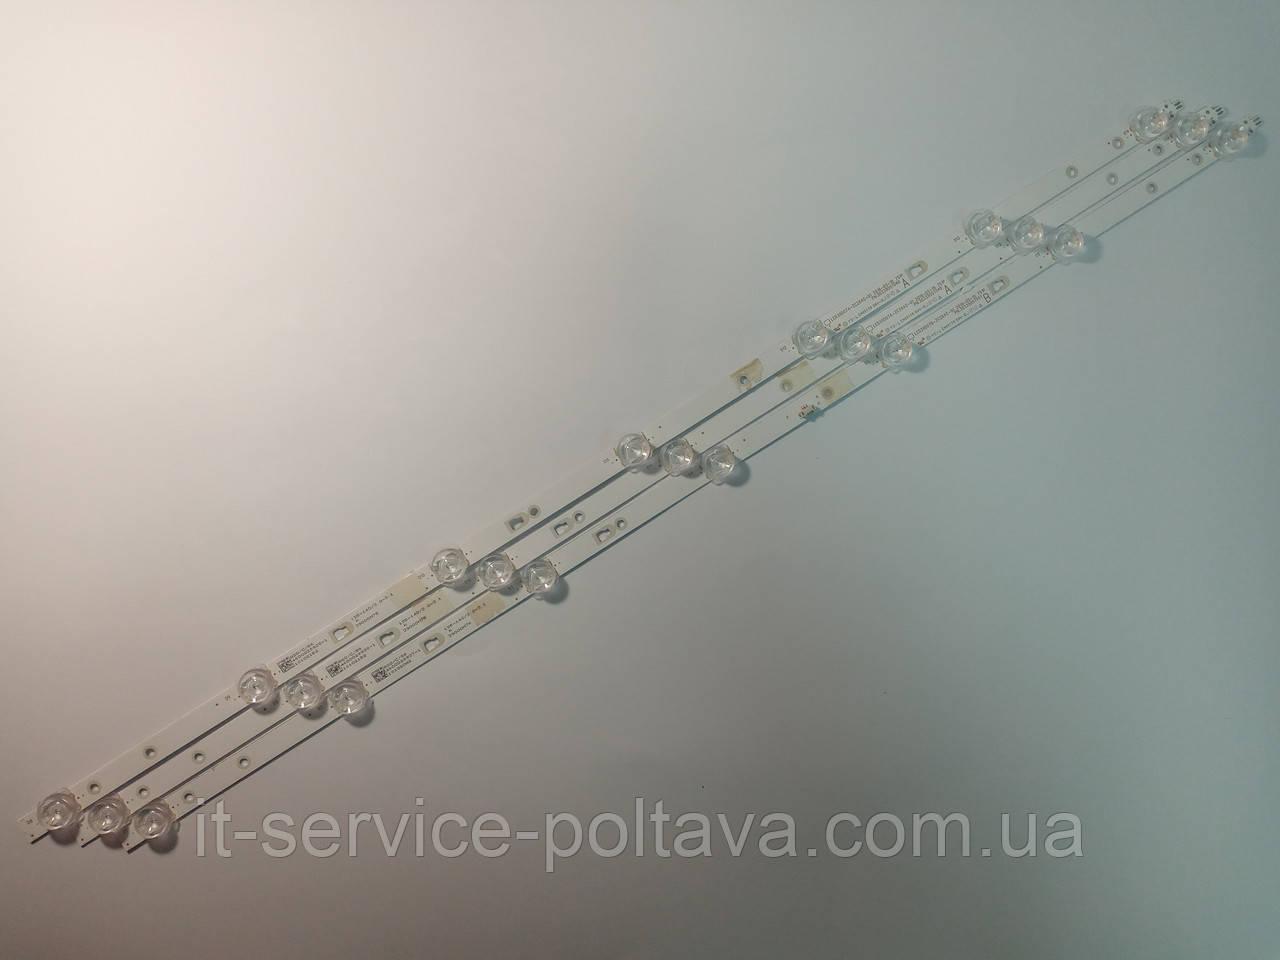 LED підсвітка LED39D07A-ZC26AG-01 телевізор KIVI